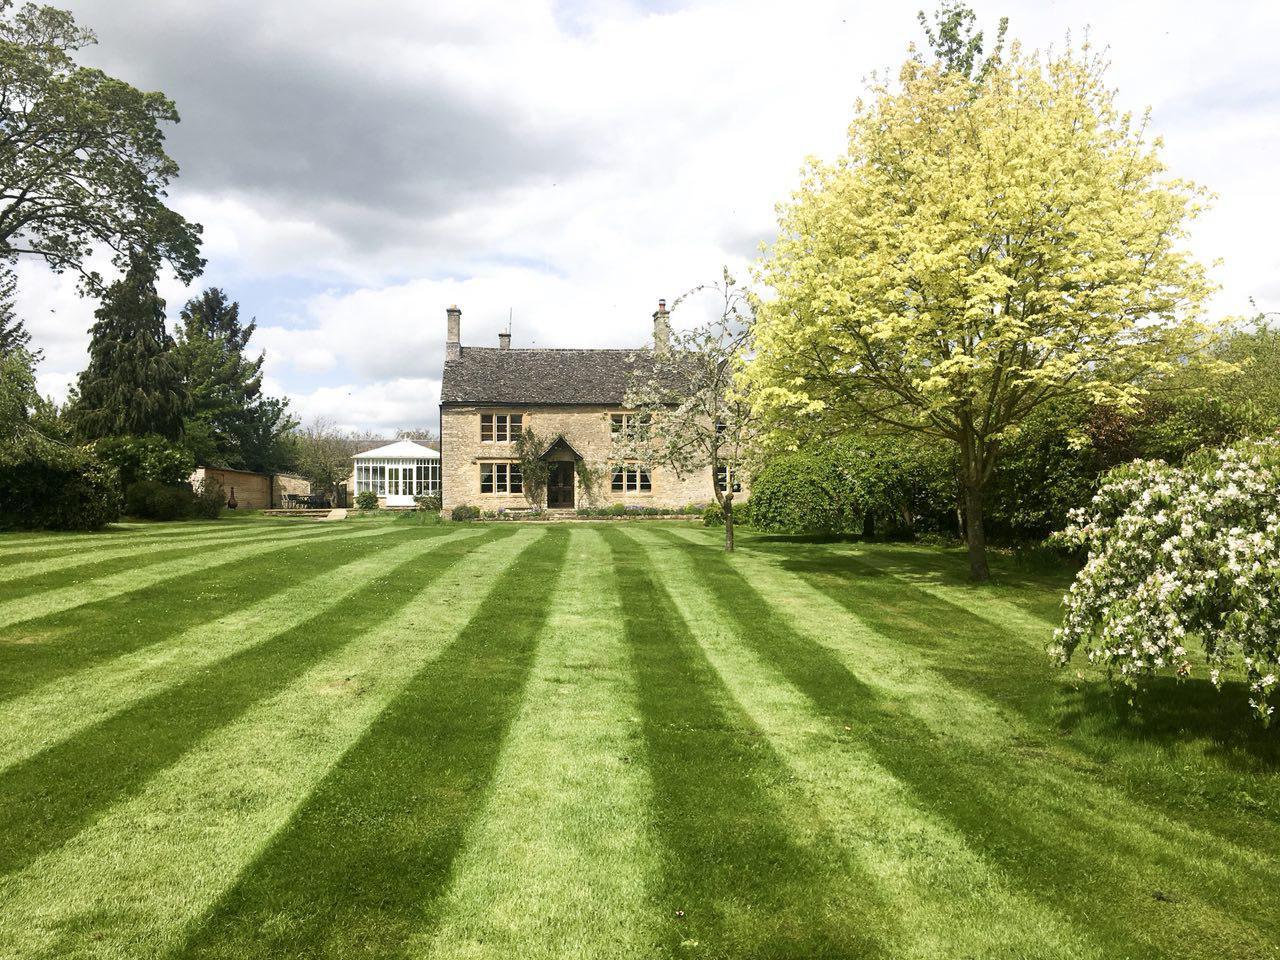 FH_stripes_lawn.jpg